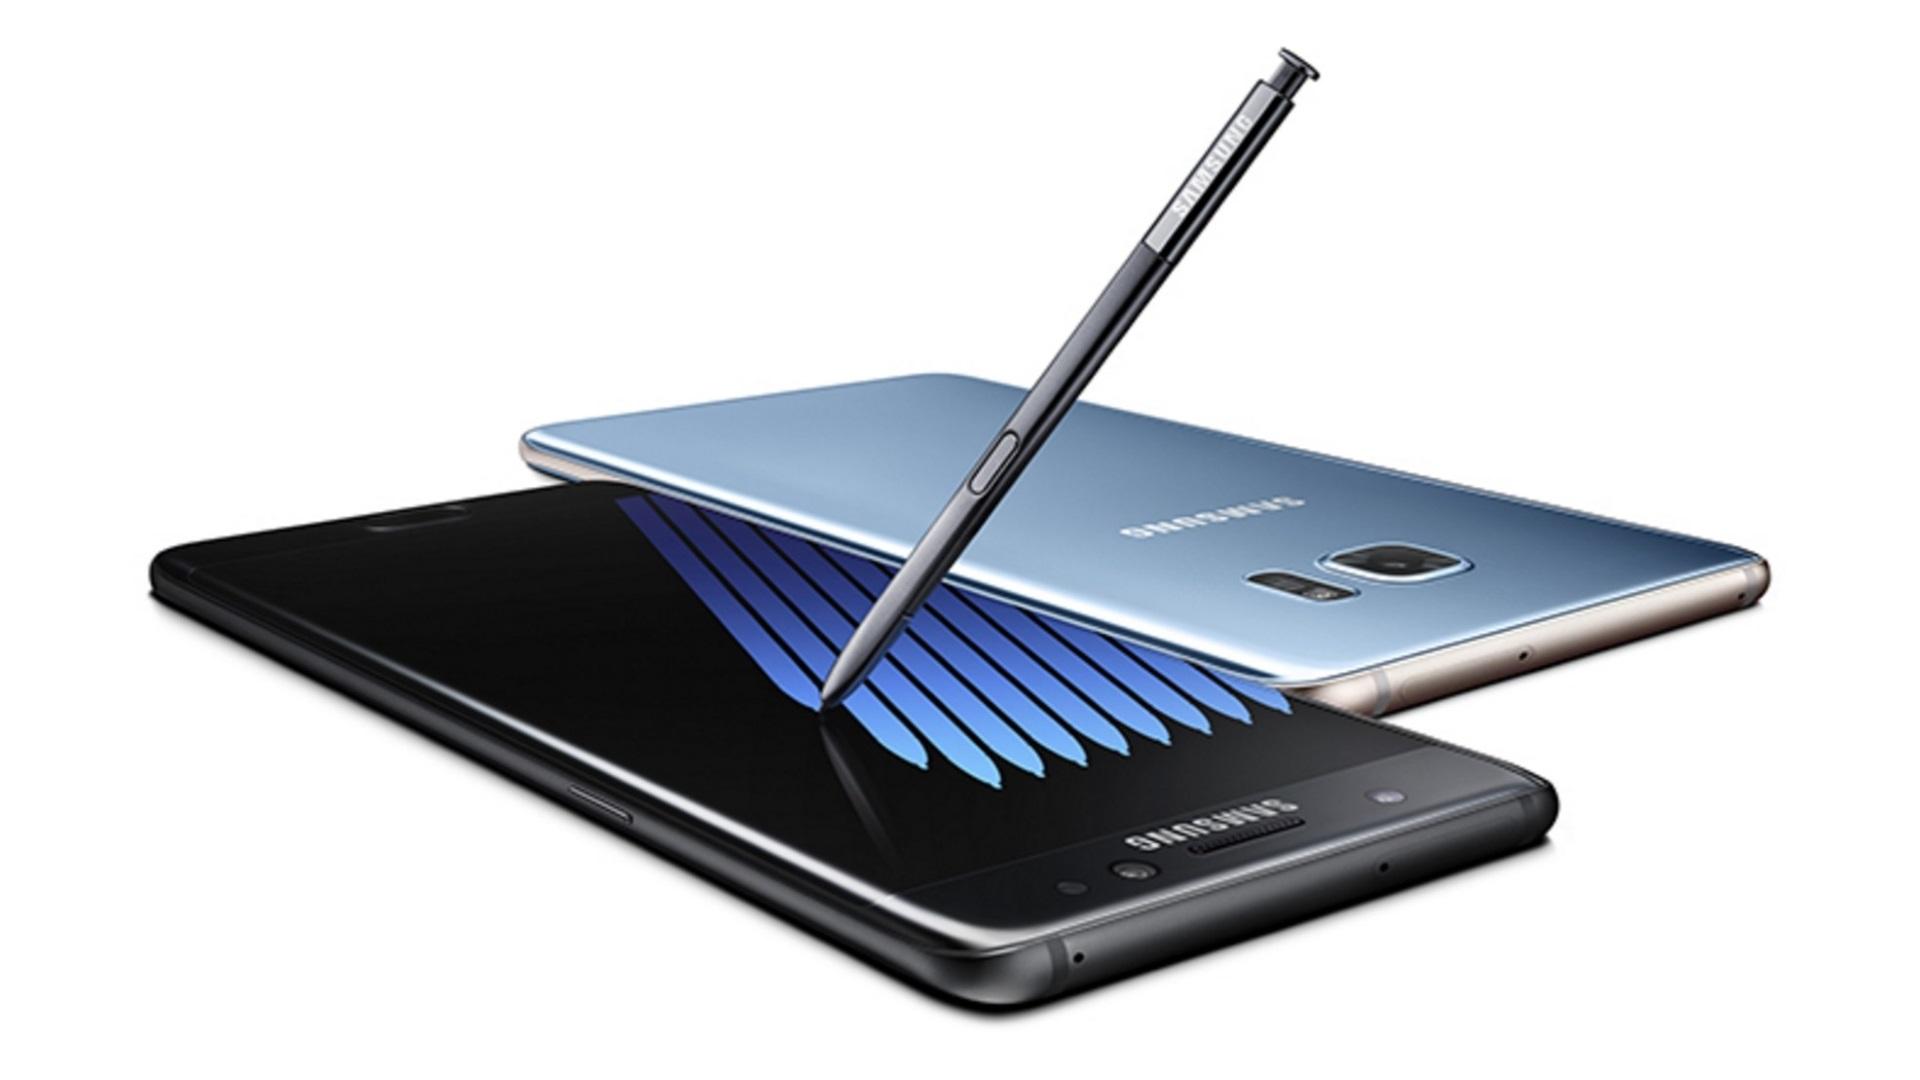 Samsungが爆発問題で回収した「Galaxy Note7」の三段階のリサイクル構想を発表、バッテリーを一新しての再販は?